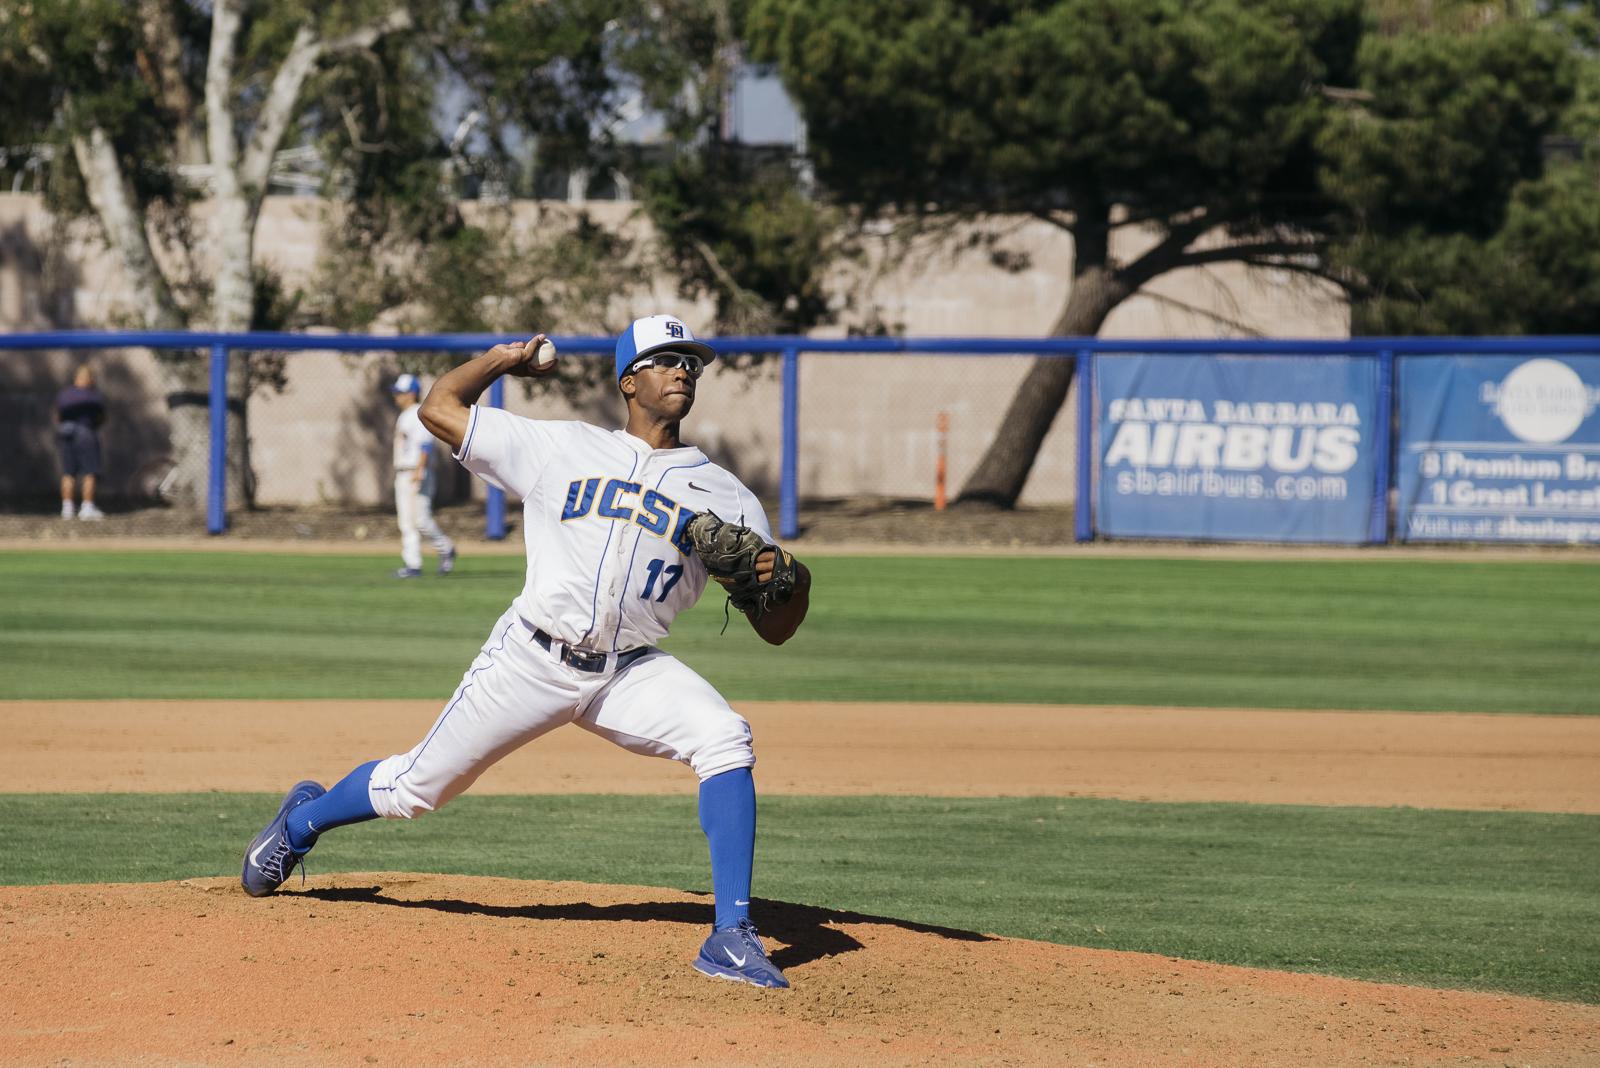 Dillon Tate throws a pitch. Hari Patel/Daily Nexus